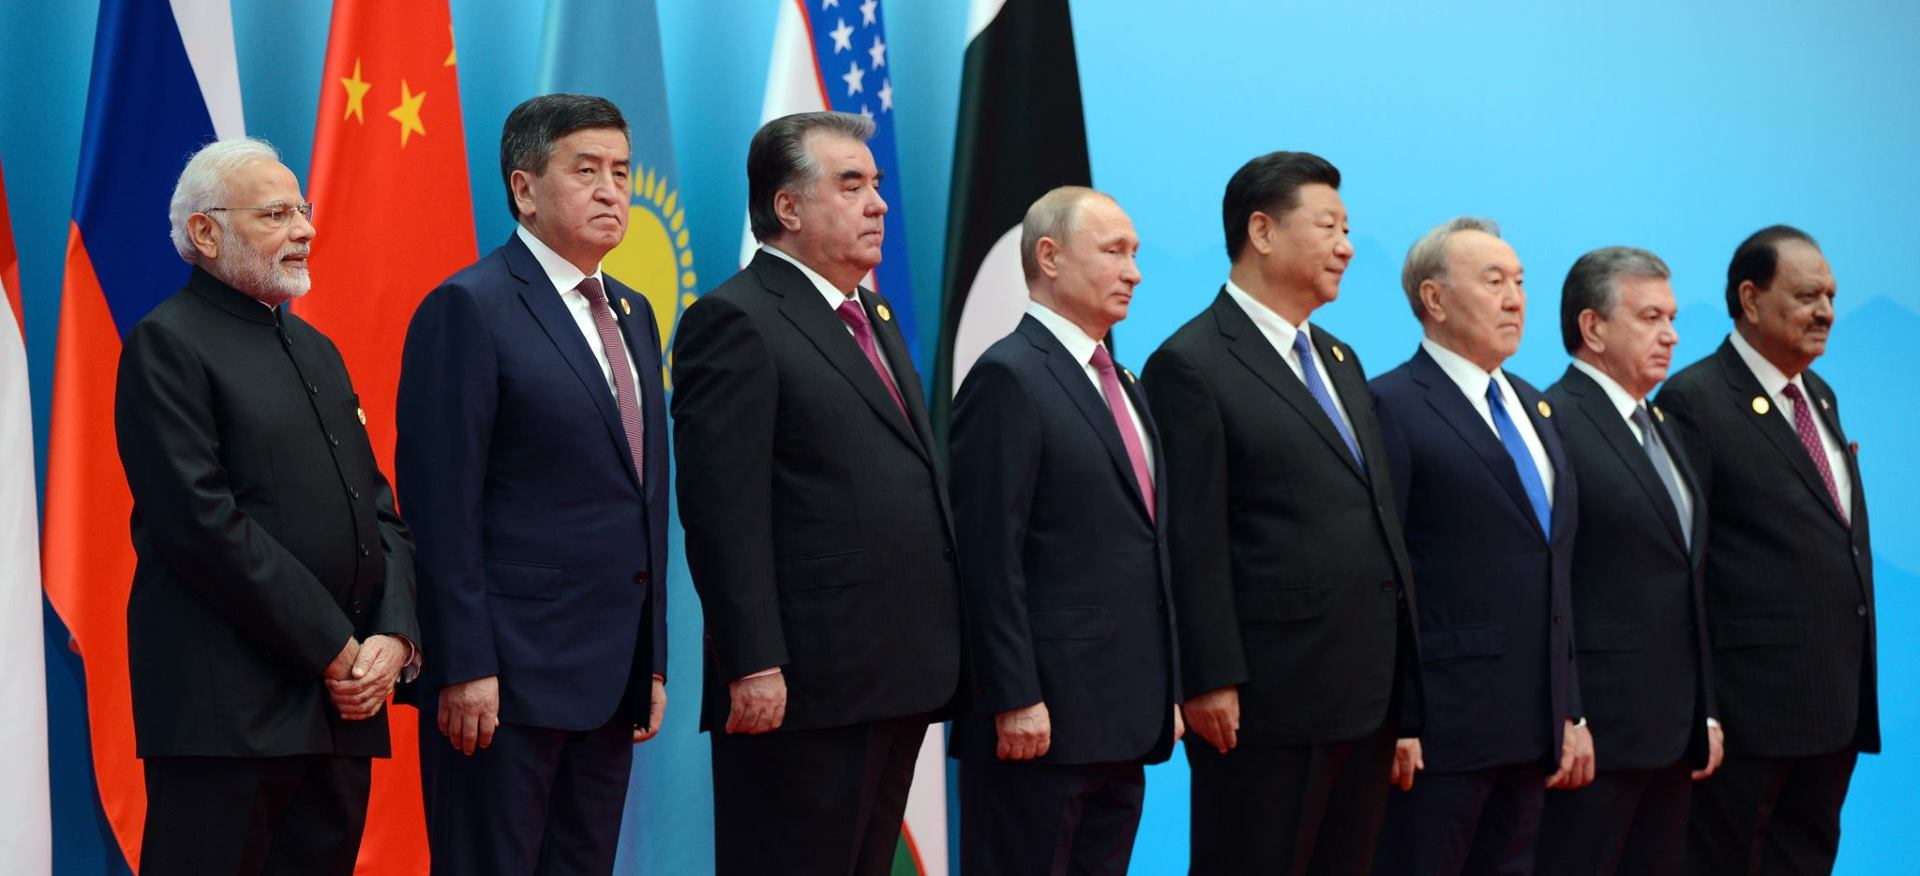 VIDEO: Kratak pregled događanja na summitu Shanghai Cooperation Organisationa (SCO)